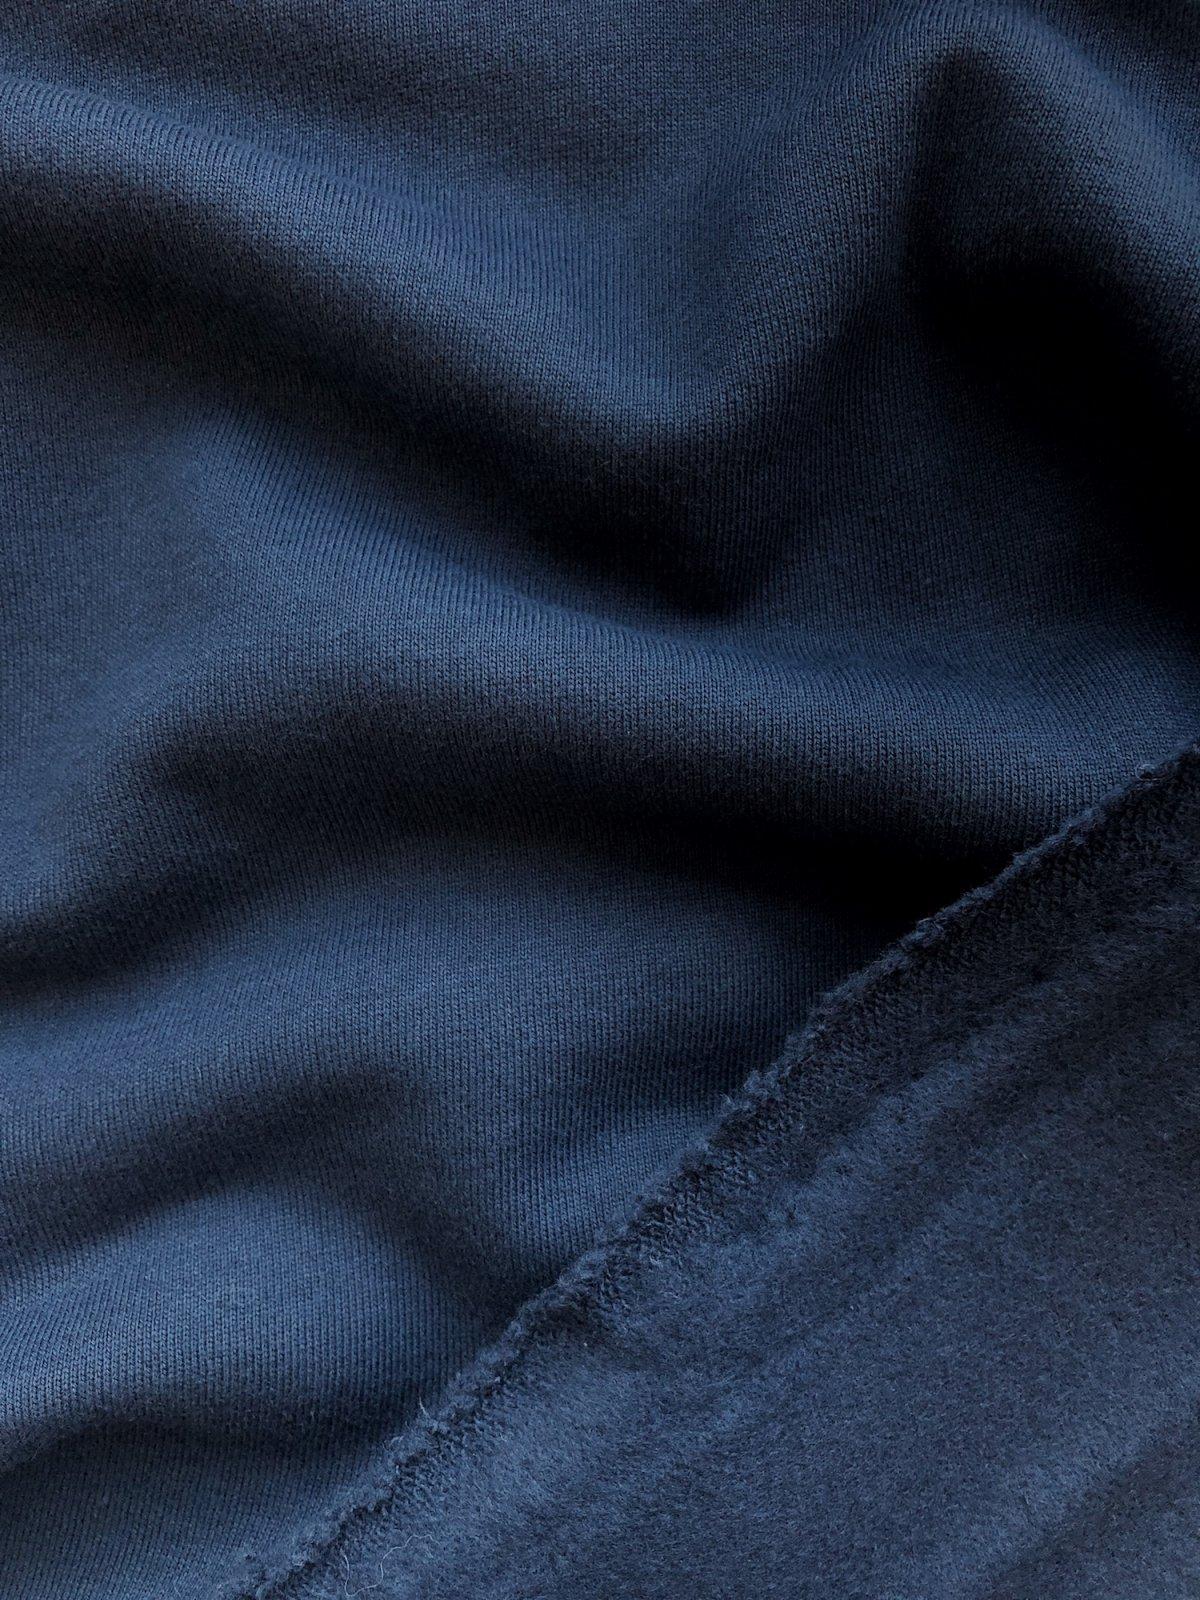 Birch Fabrics - Organic Sweatshirt Fleece - Dusk